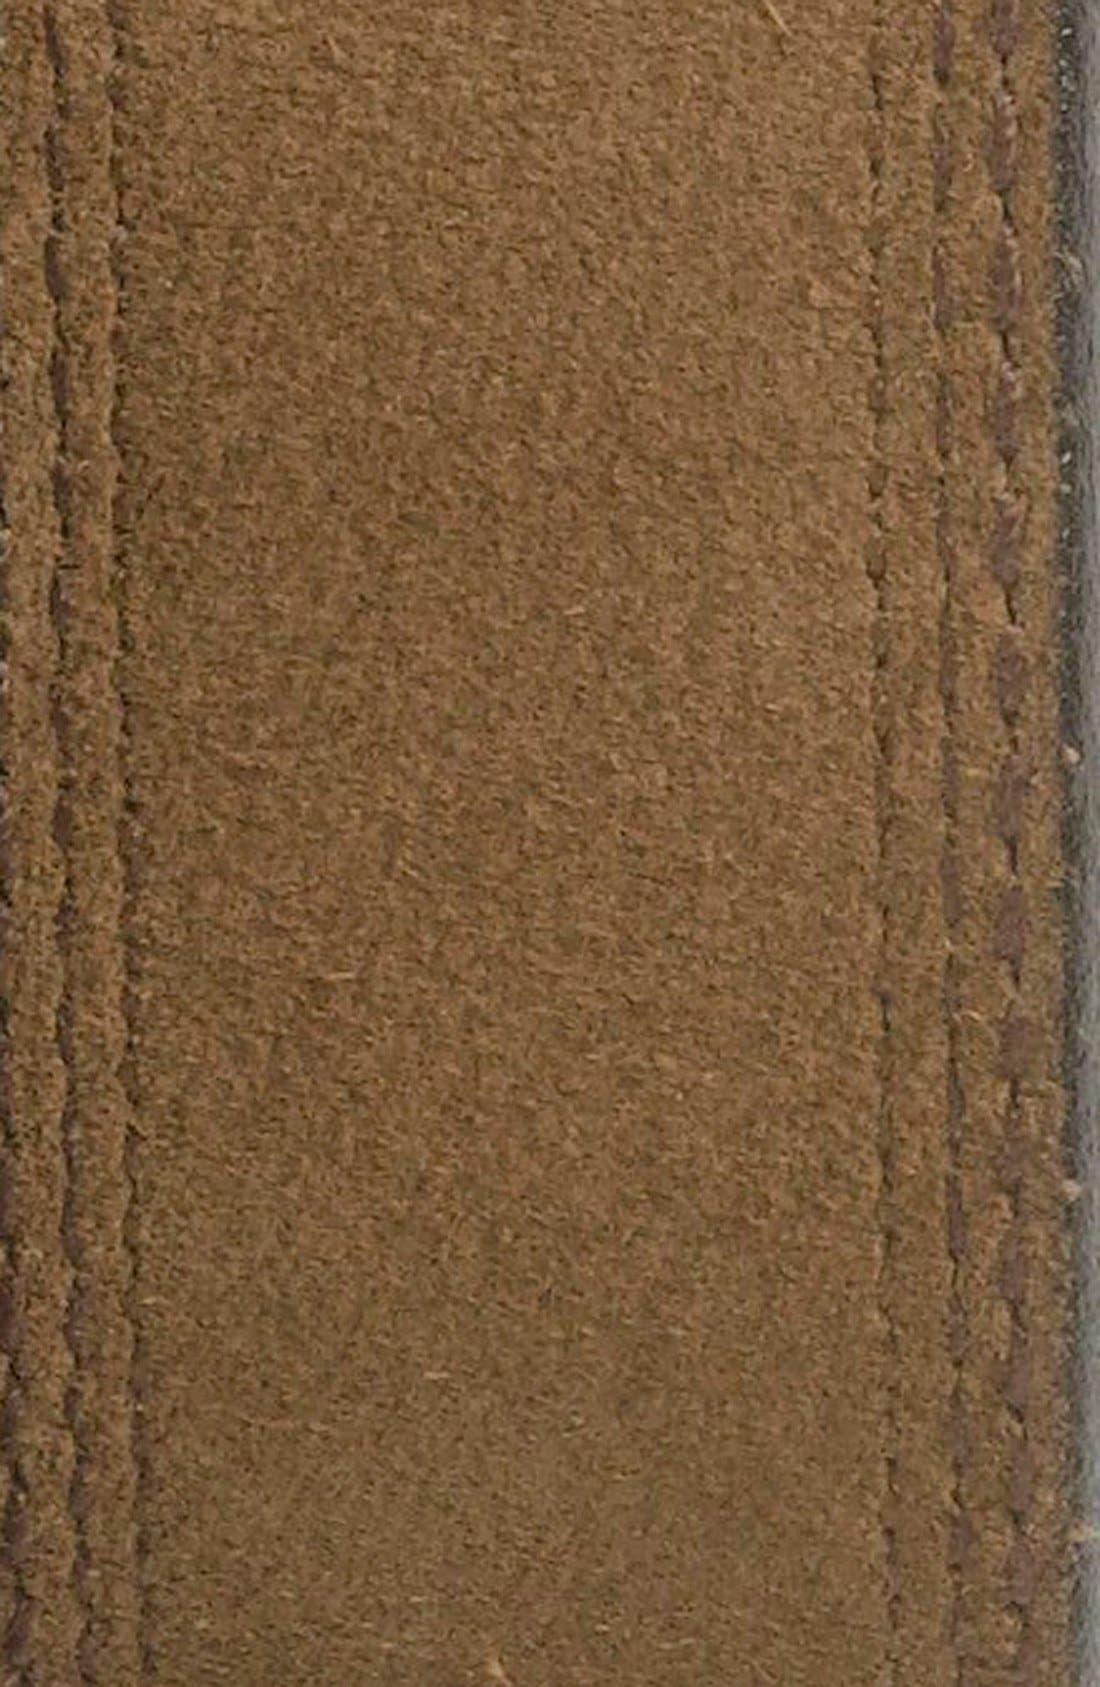 Alternate Image 3  - Remo Tulliani 'Carmesi' Belt